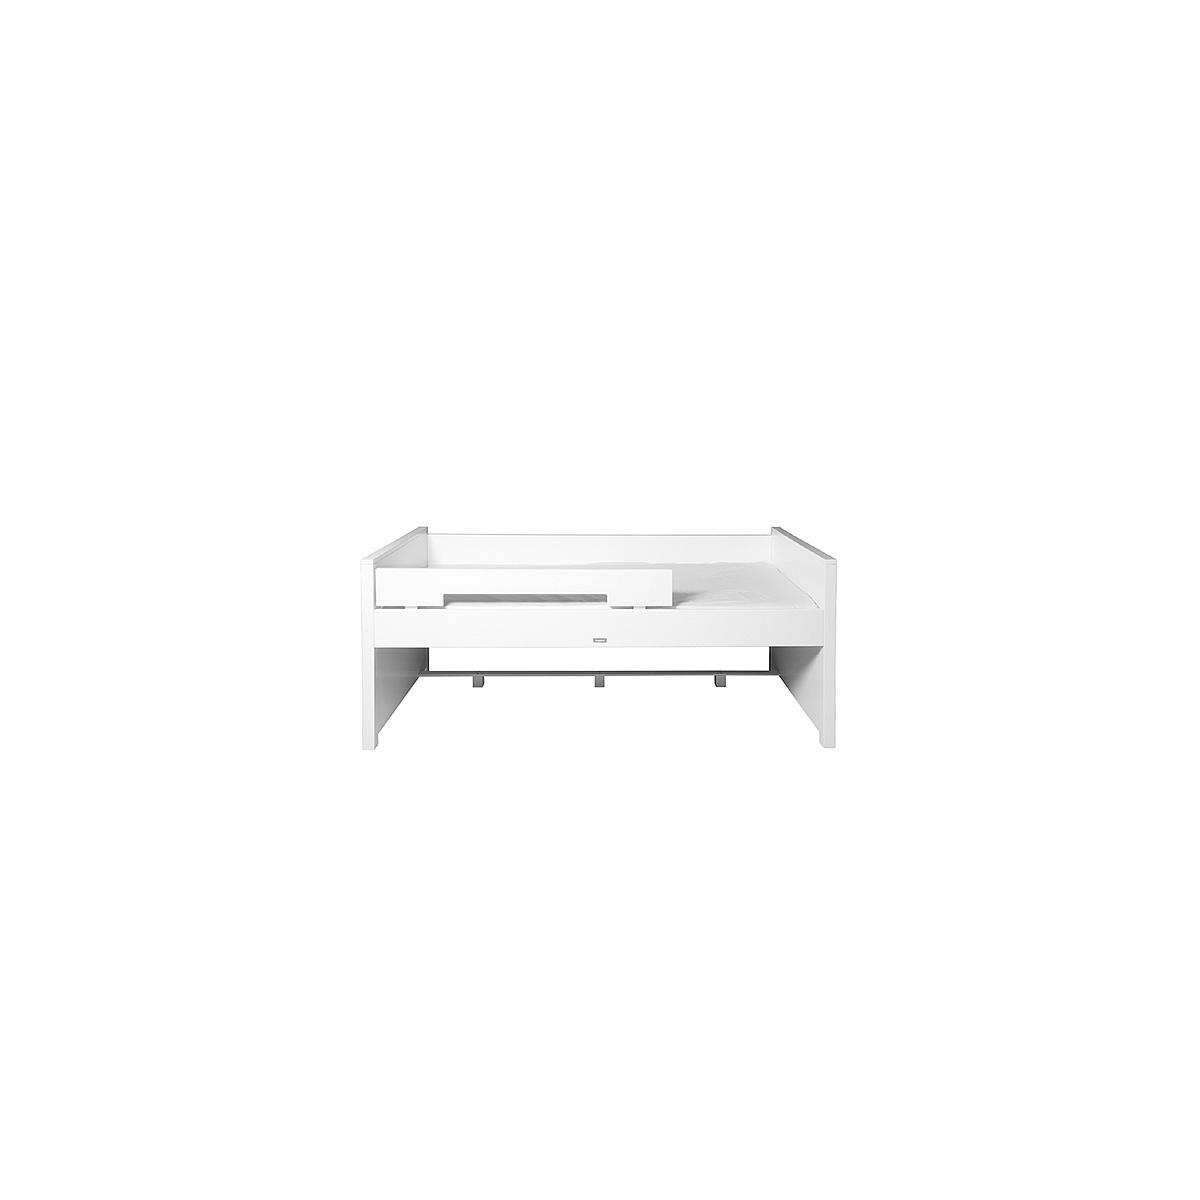 Cama compacta 90x200cm TIMO Bopita blanco